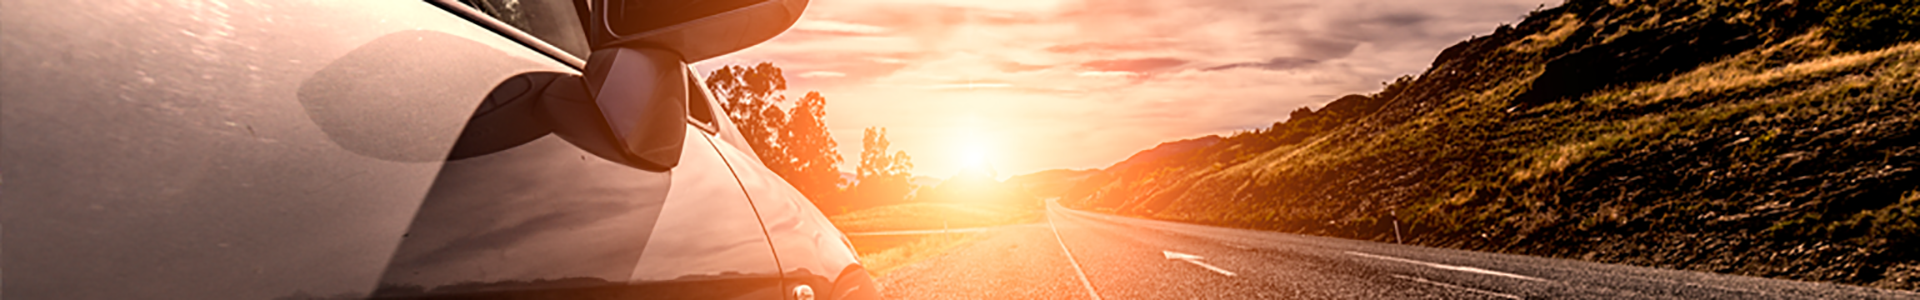 Autoescuela Alimar-Banner